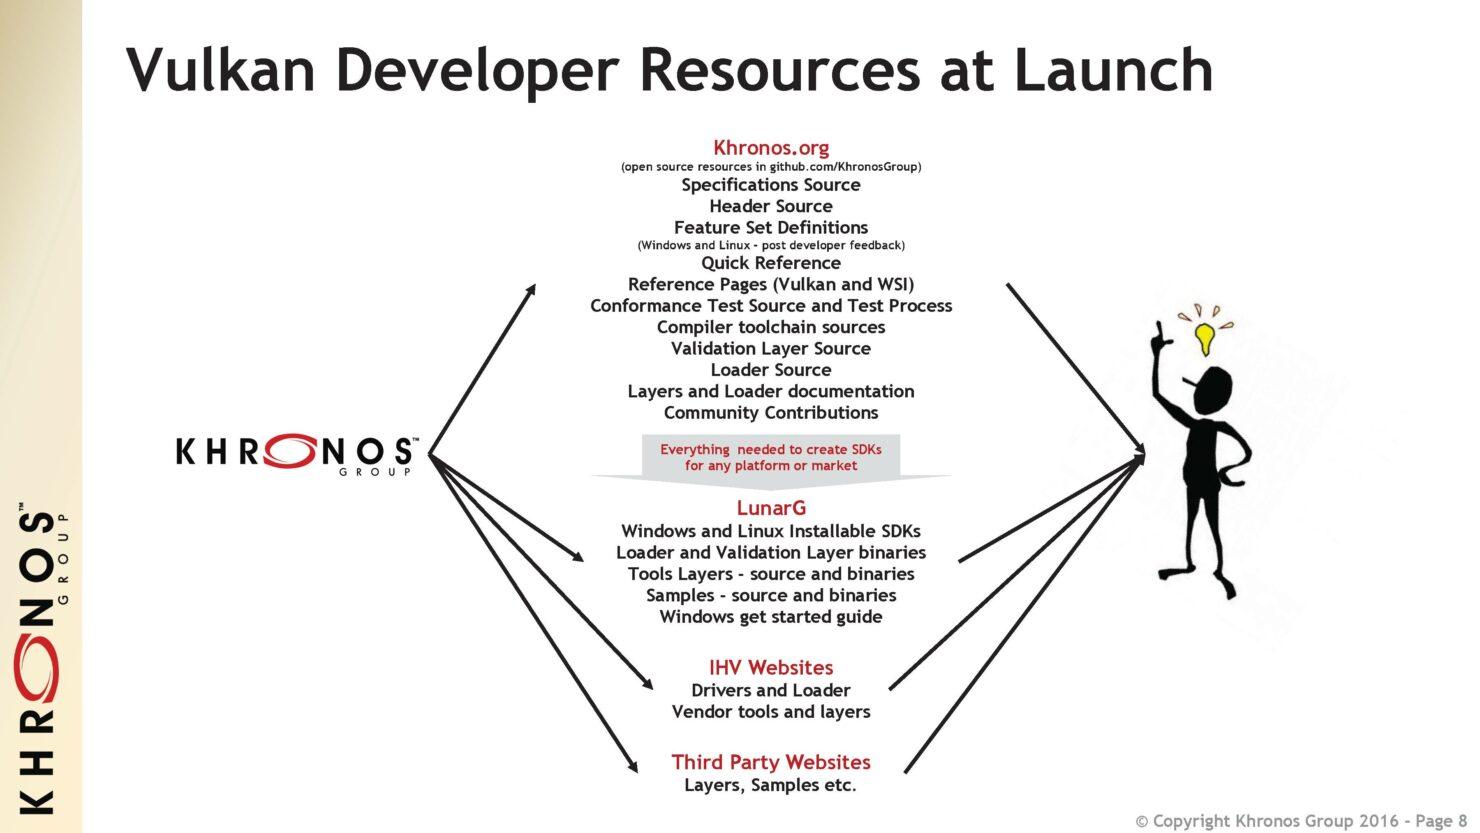 vulkan-api-1-0-launch-day-briefing-8